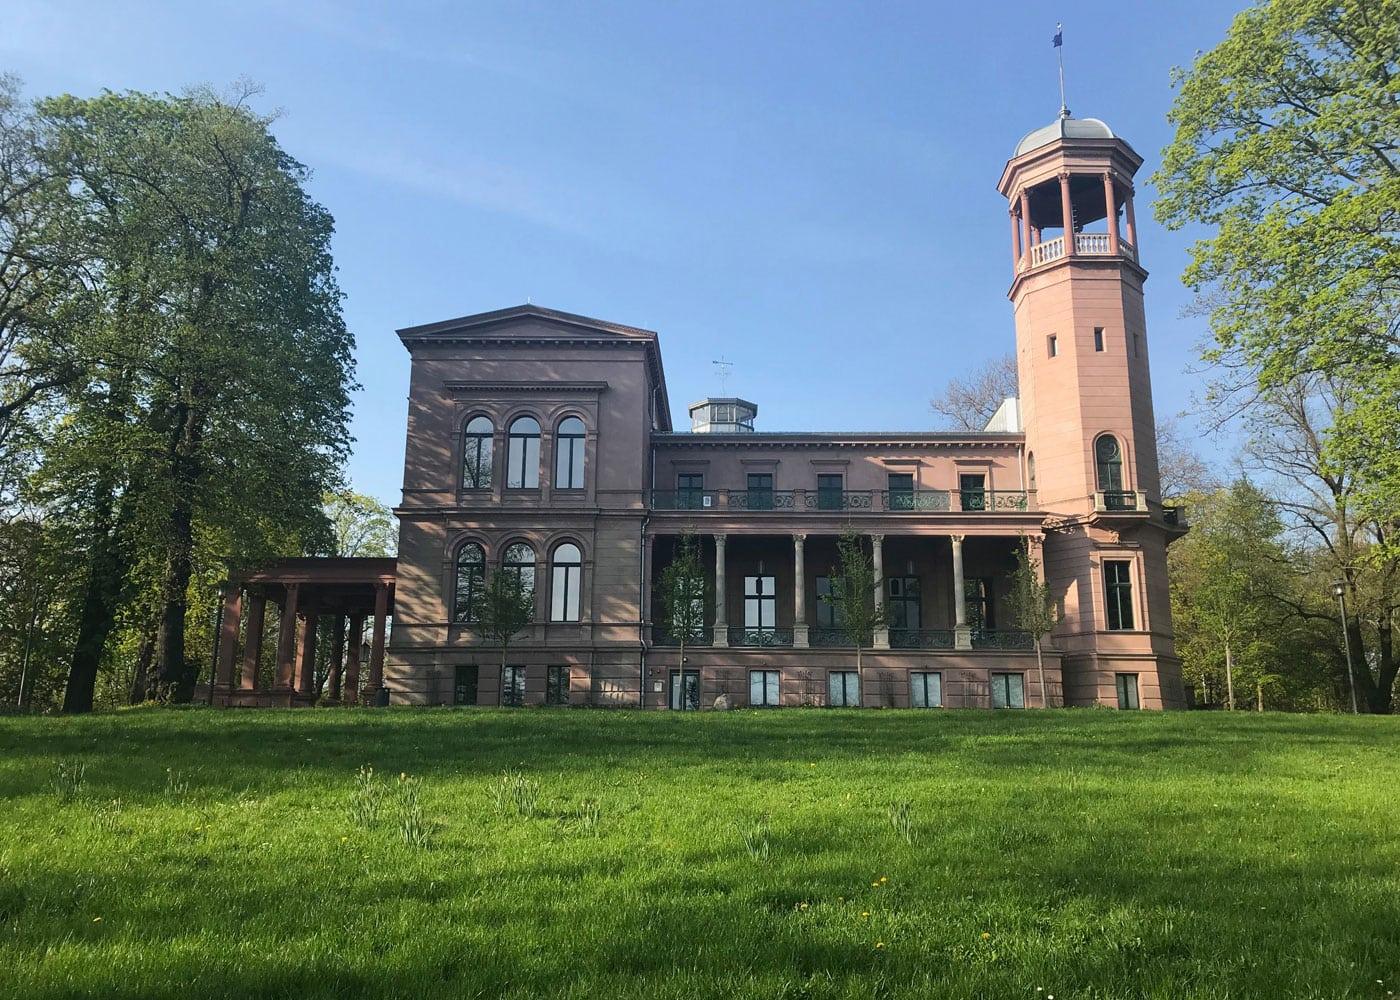 Ausflugsziel mit Kindern: Schloss Biesdorf Berlin-Marzahn // HIMBEER